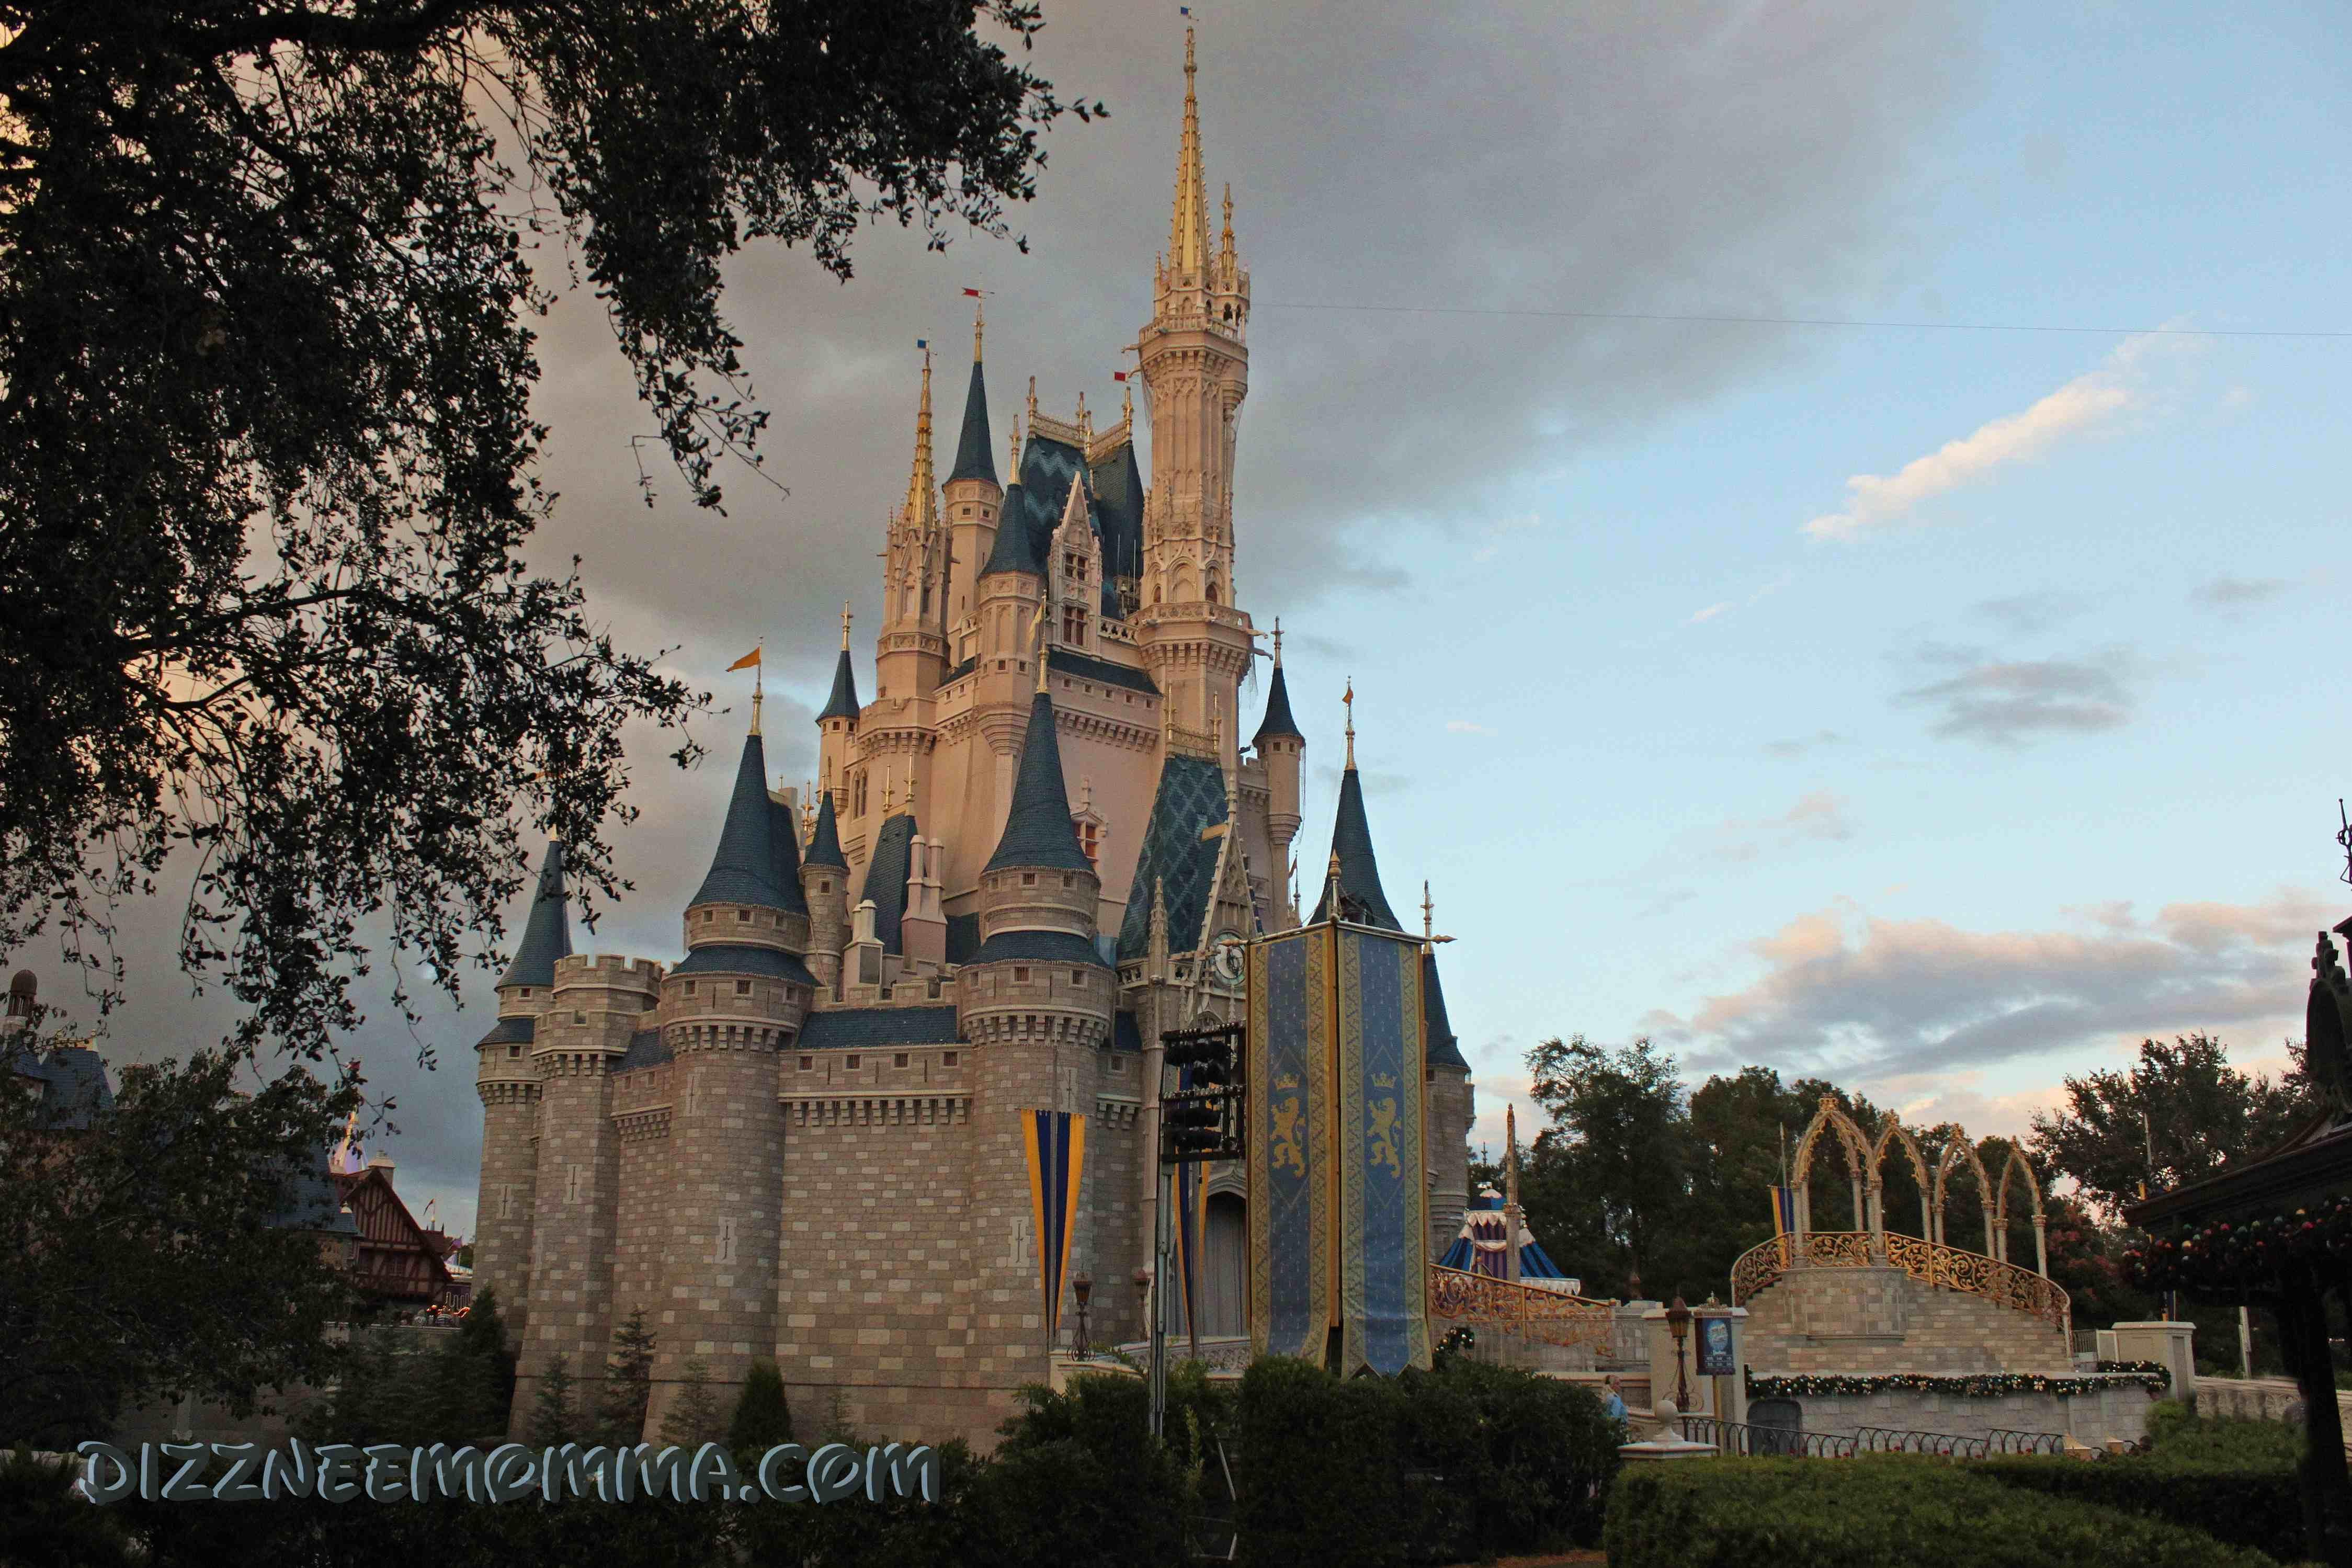 Cinderella's Castle at Walt Disney World Resort in Florida